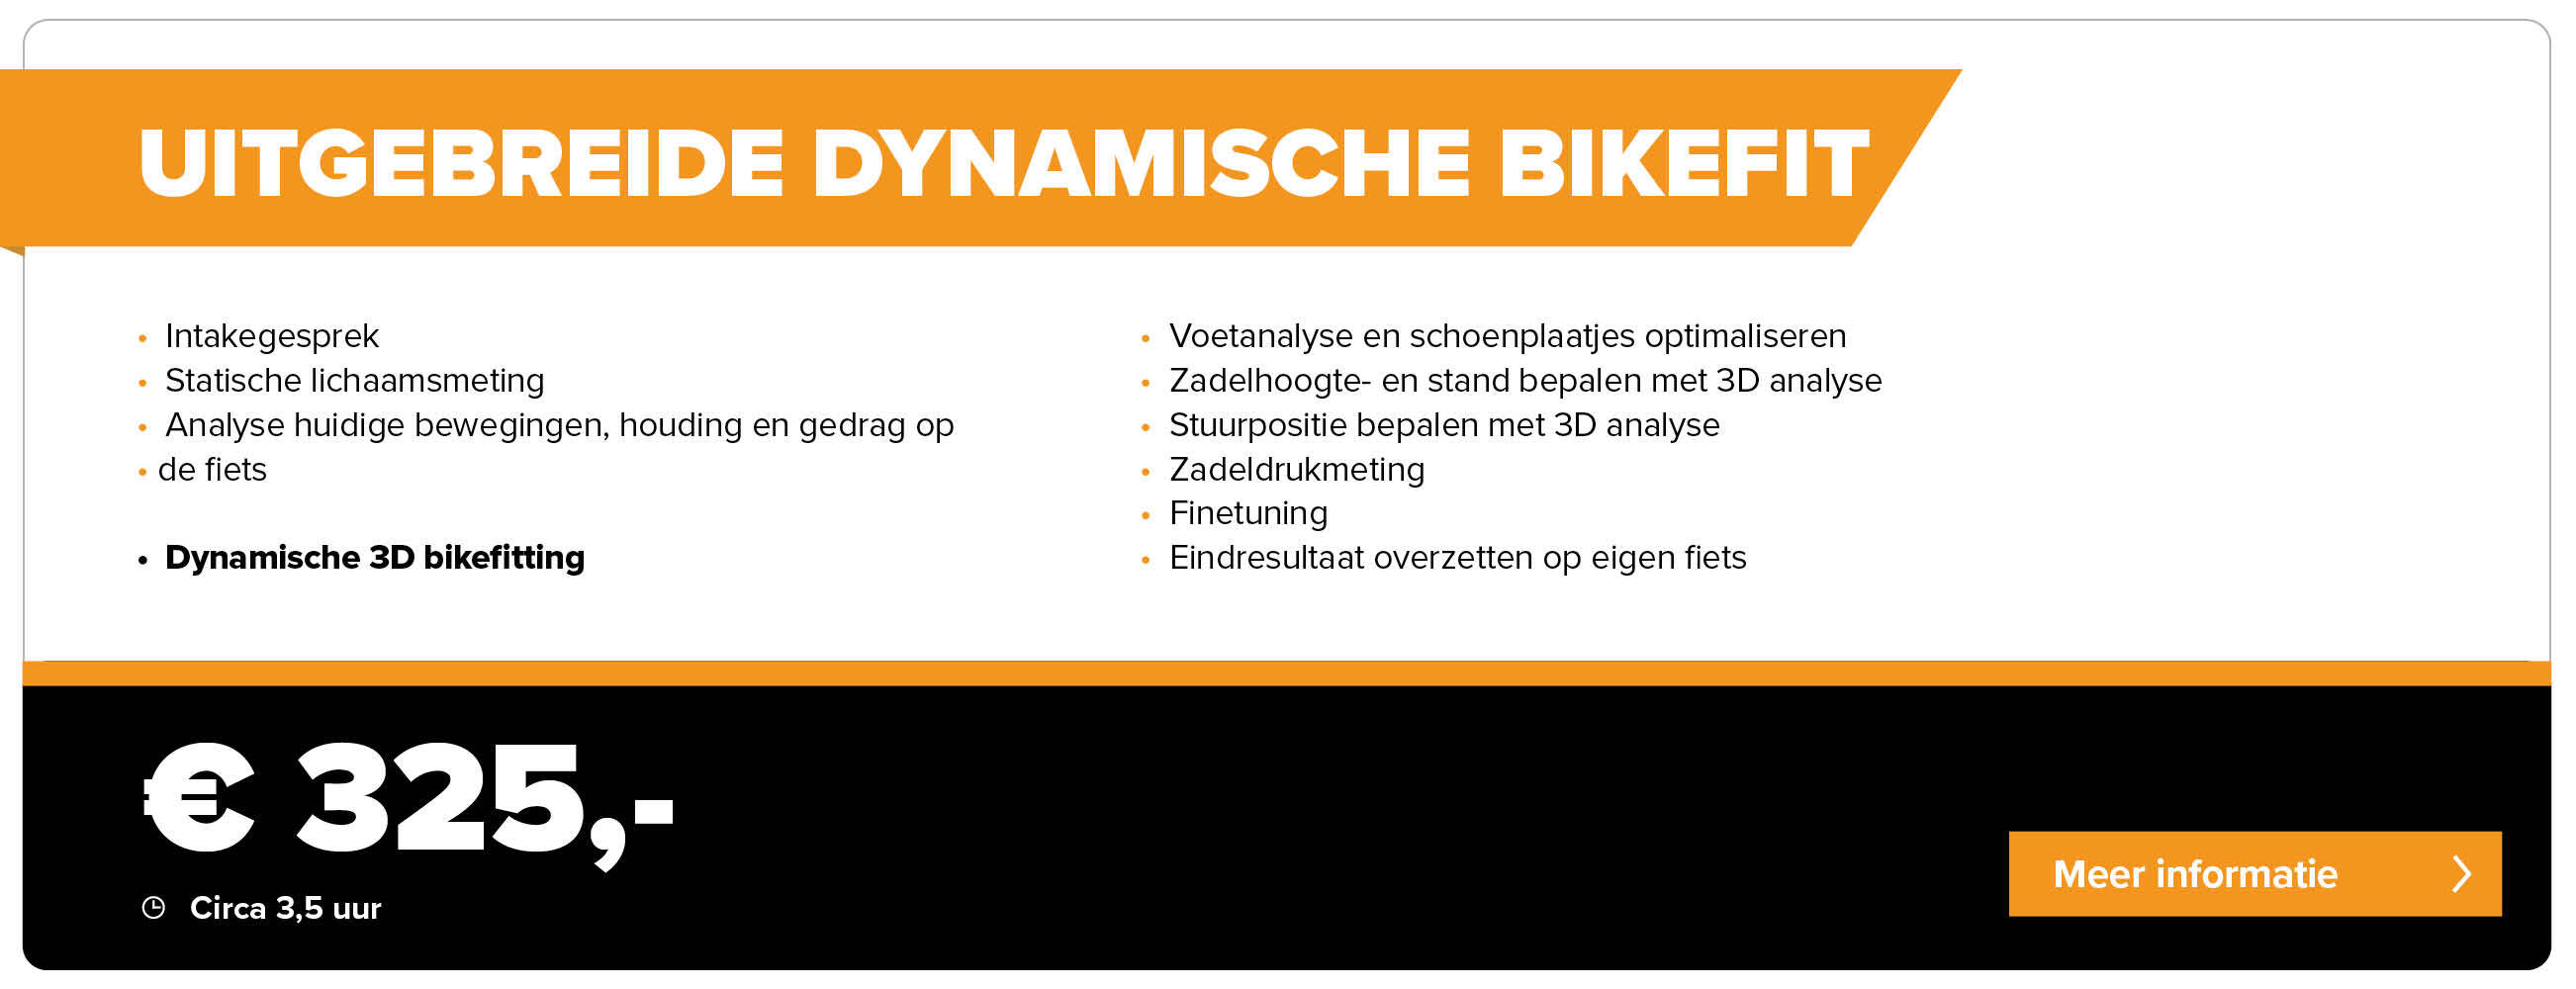 bikefit laten doen bij 12go biking